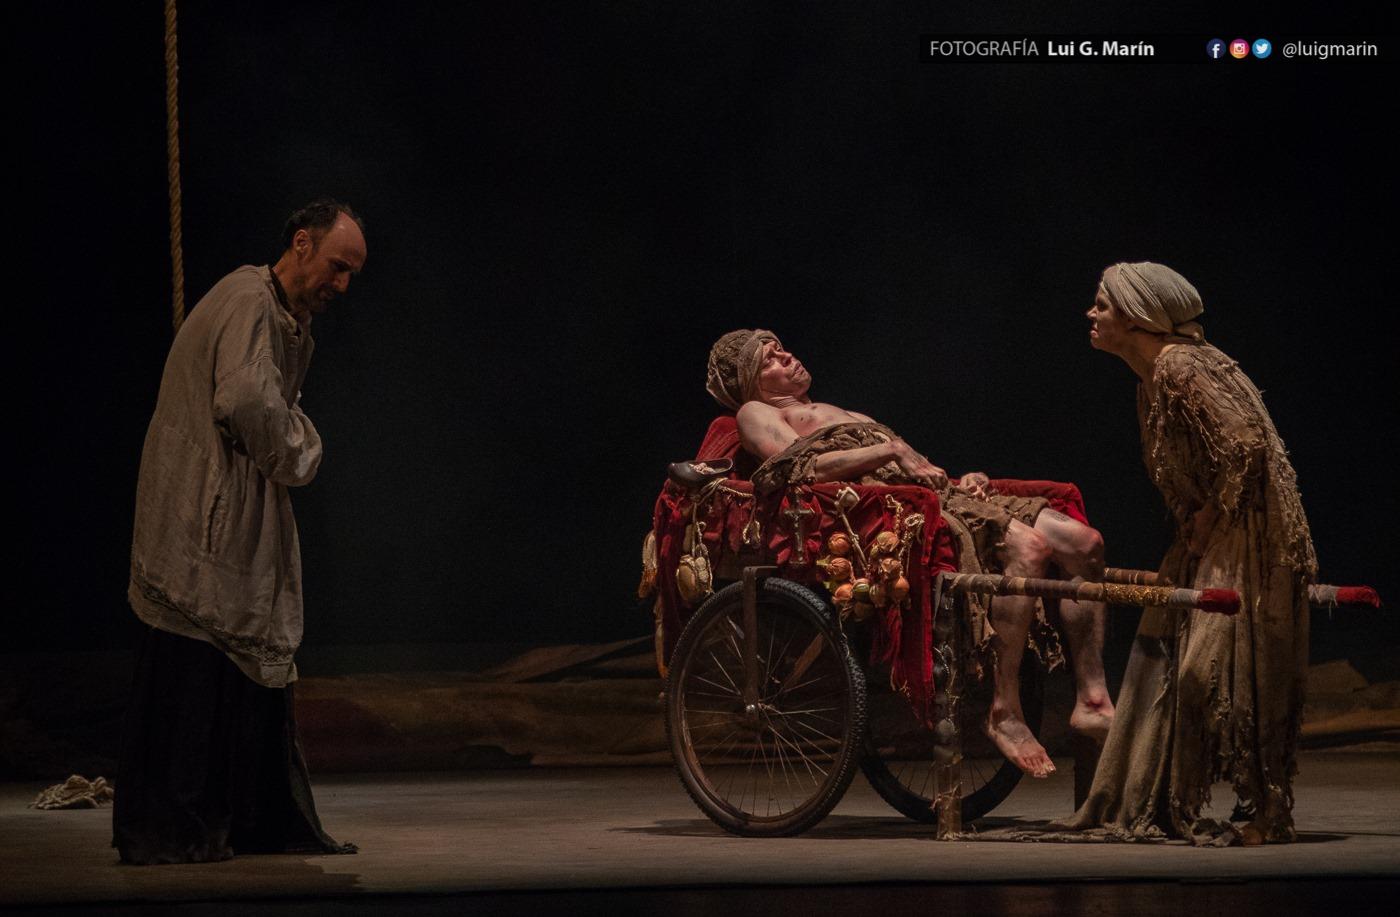 Festival de Teatro de Málaga – Divinas Palabras